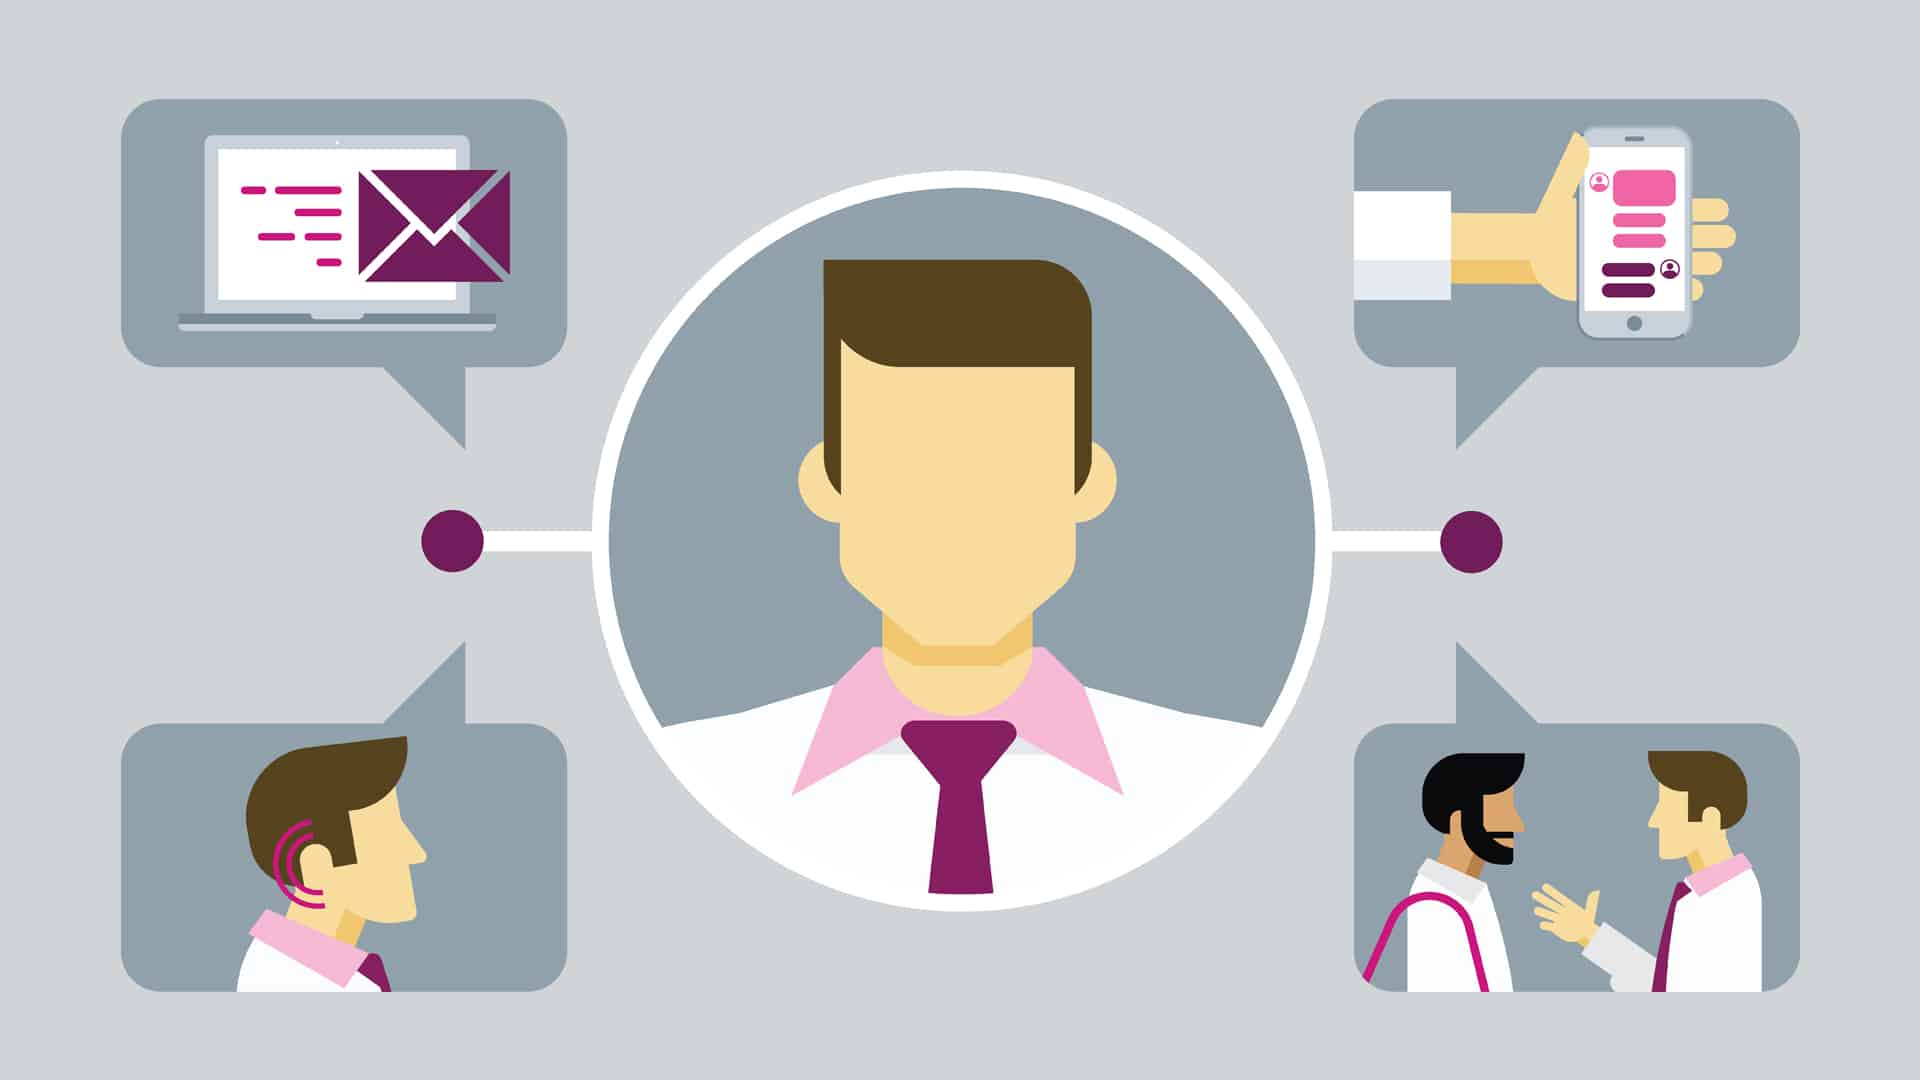 hire dot net developer, Top 7 Reasons To Hire Dot Net Developer from an Offshore Development Company